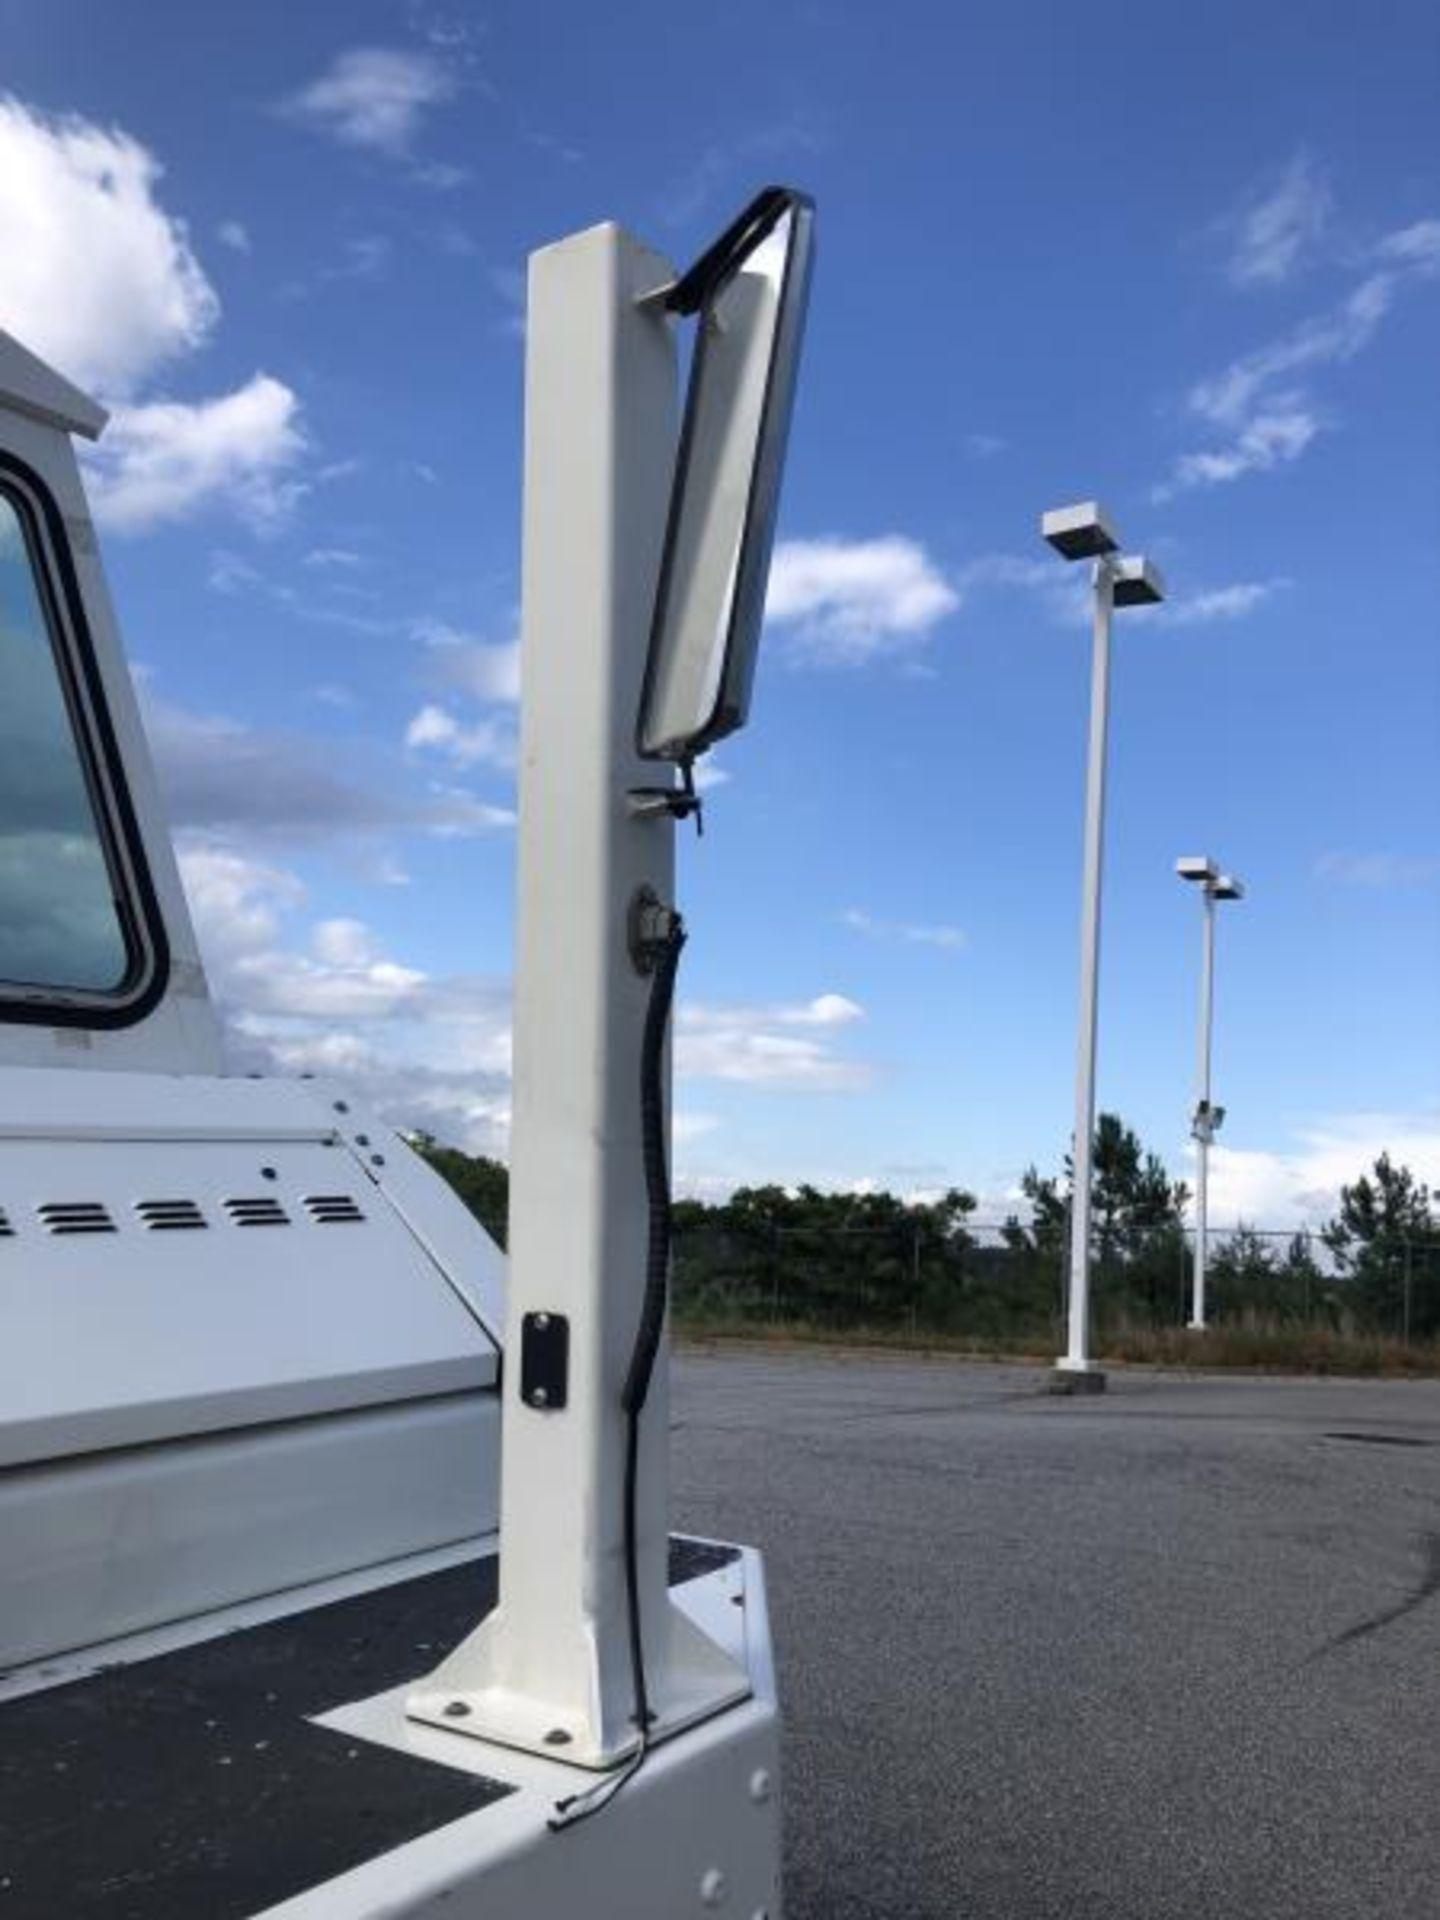 2015 Kalmar Ottawa 4x2 Yard Truck , SN: 338837 3,239.3 Hours, 3,125 Miles - Image 18 of 32